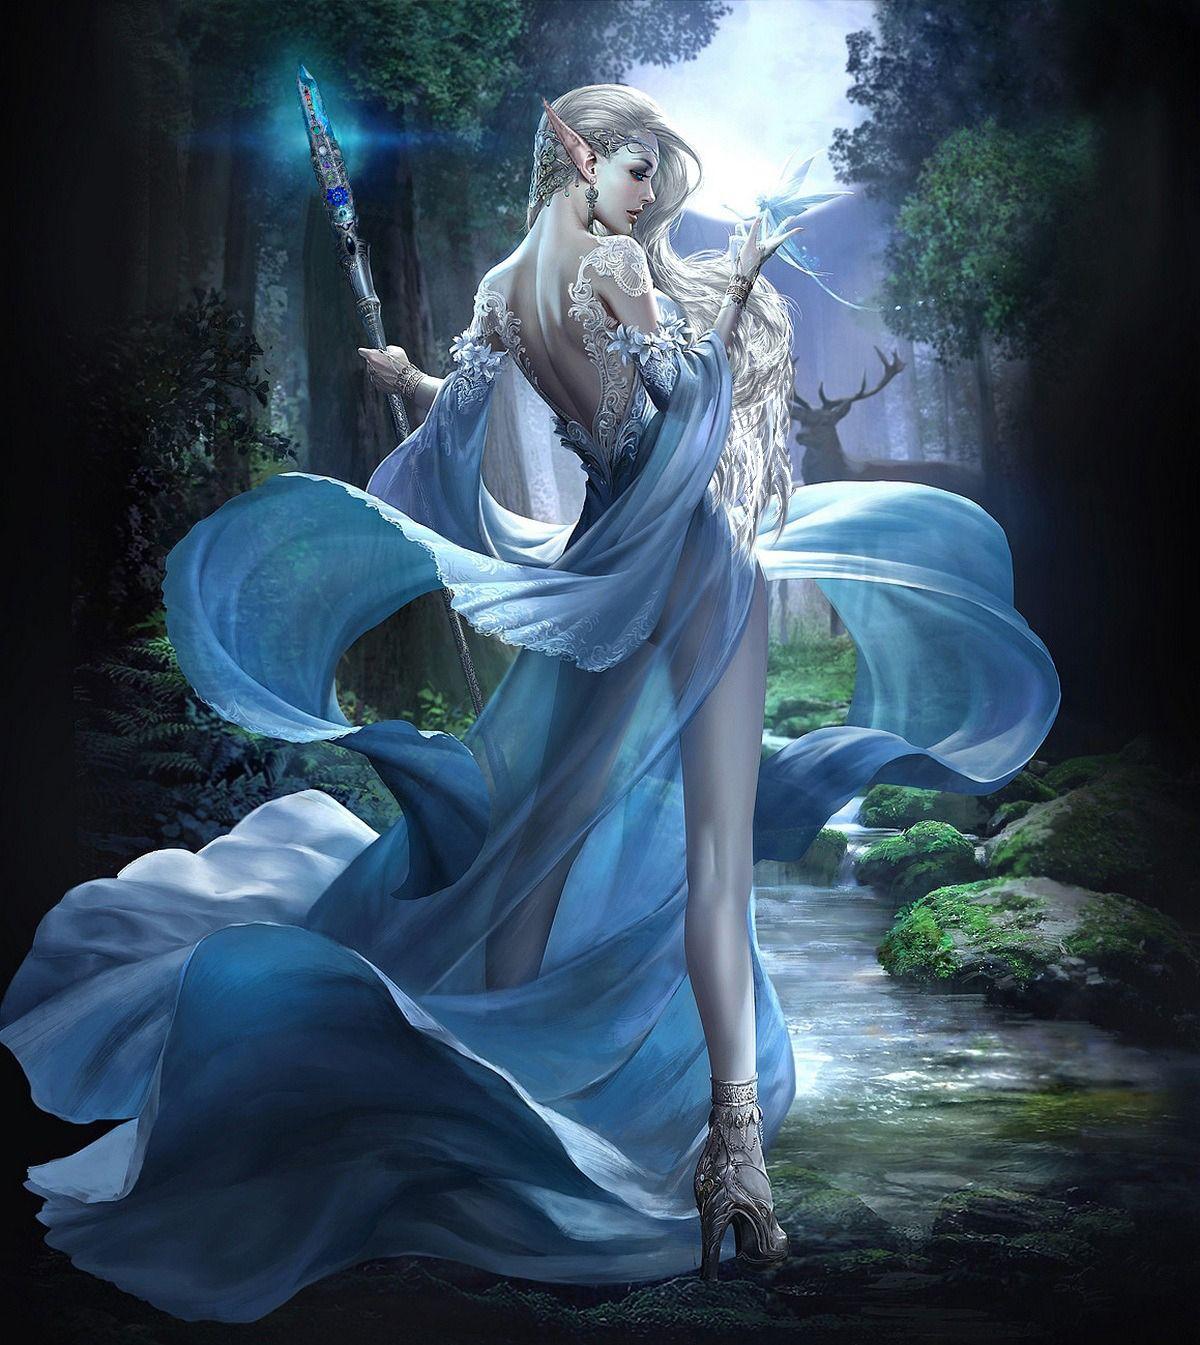 Nenil Ar Lutphen High Elf Mage Princess Rpg Character Fantasy Art Women Beautiful Fantasy Art Dark Fantasy Art